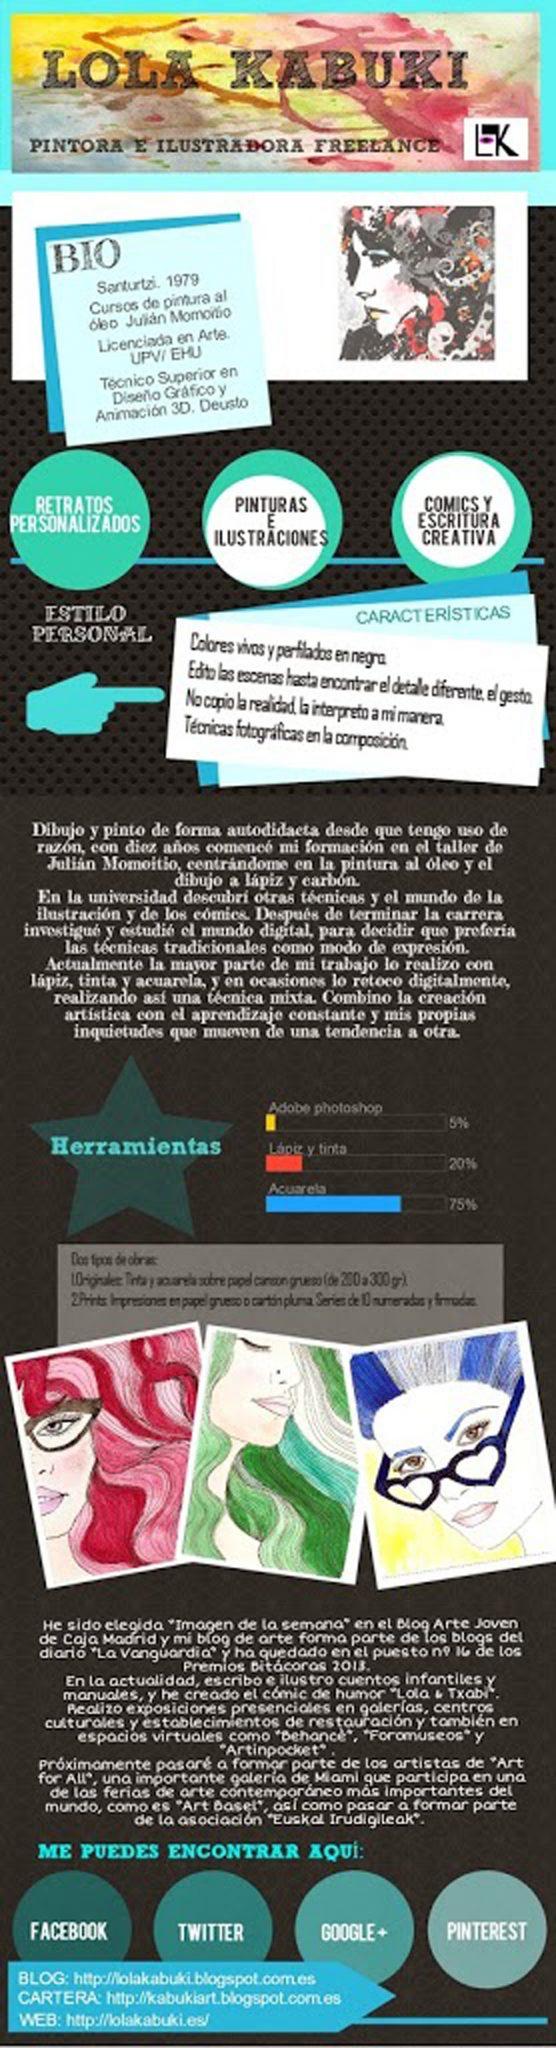 infografia-lola-kabuki